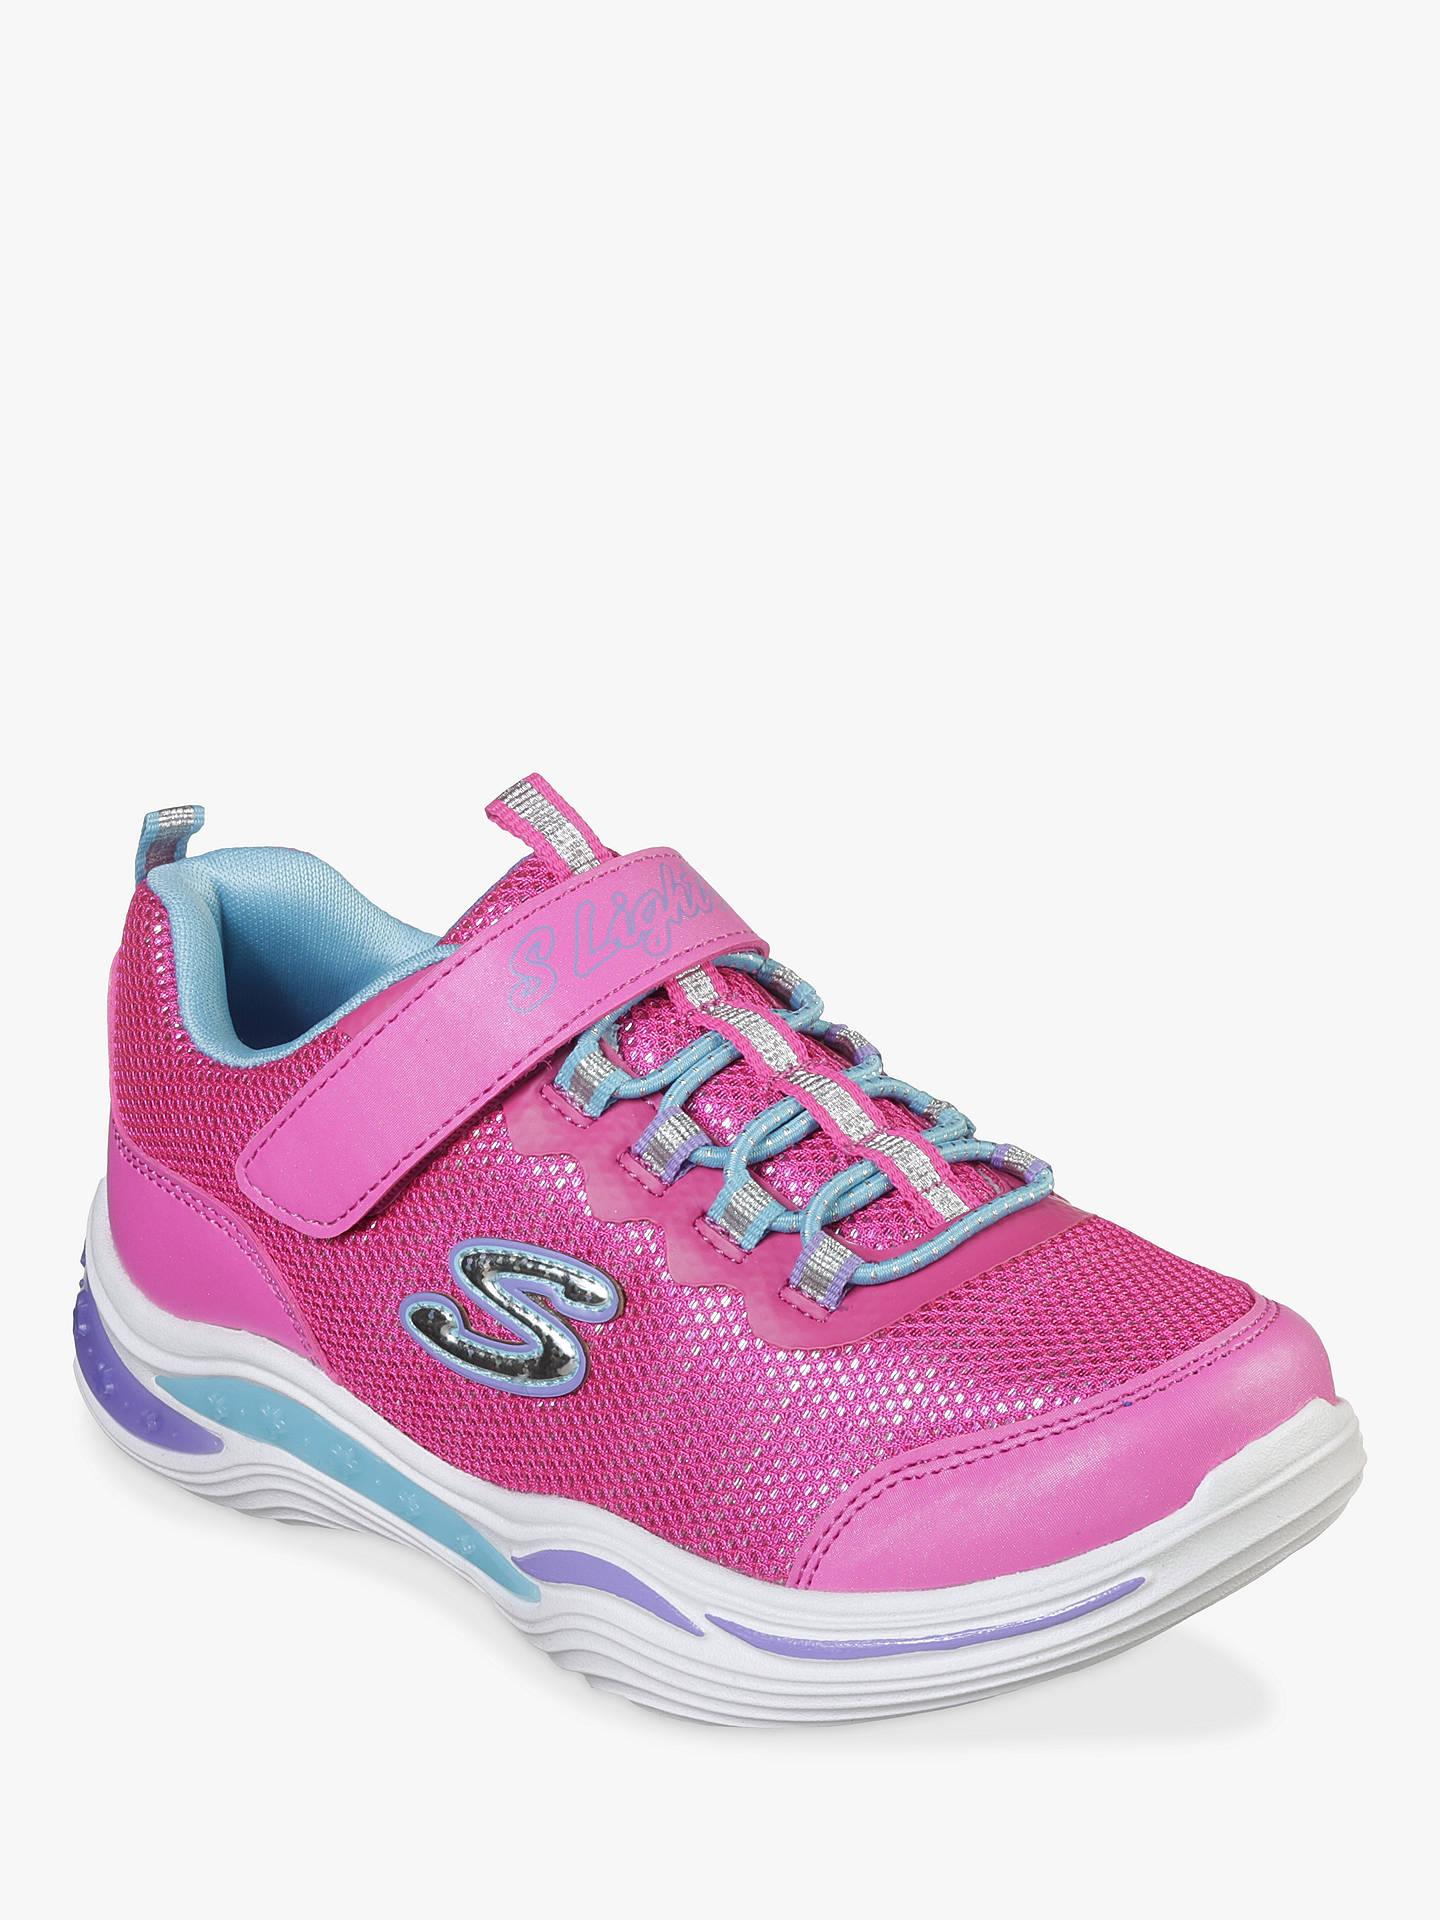 fa53b15a2b743 Skechers Children's Power Petals Trainers, Pink/Multi